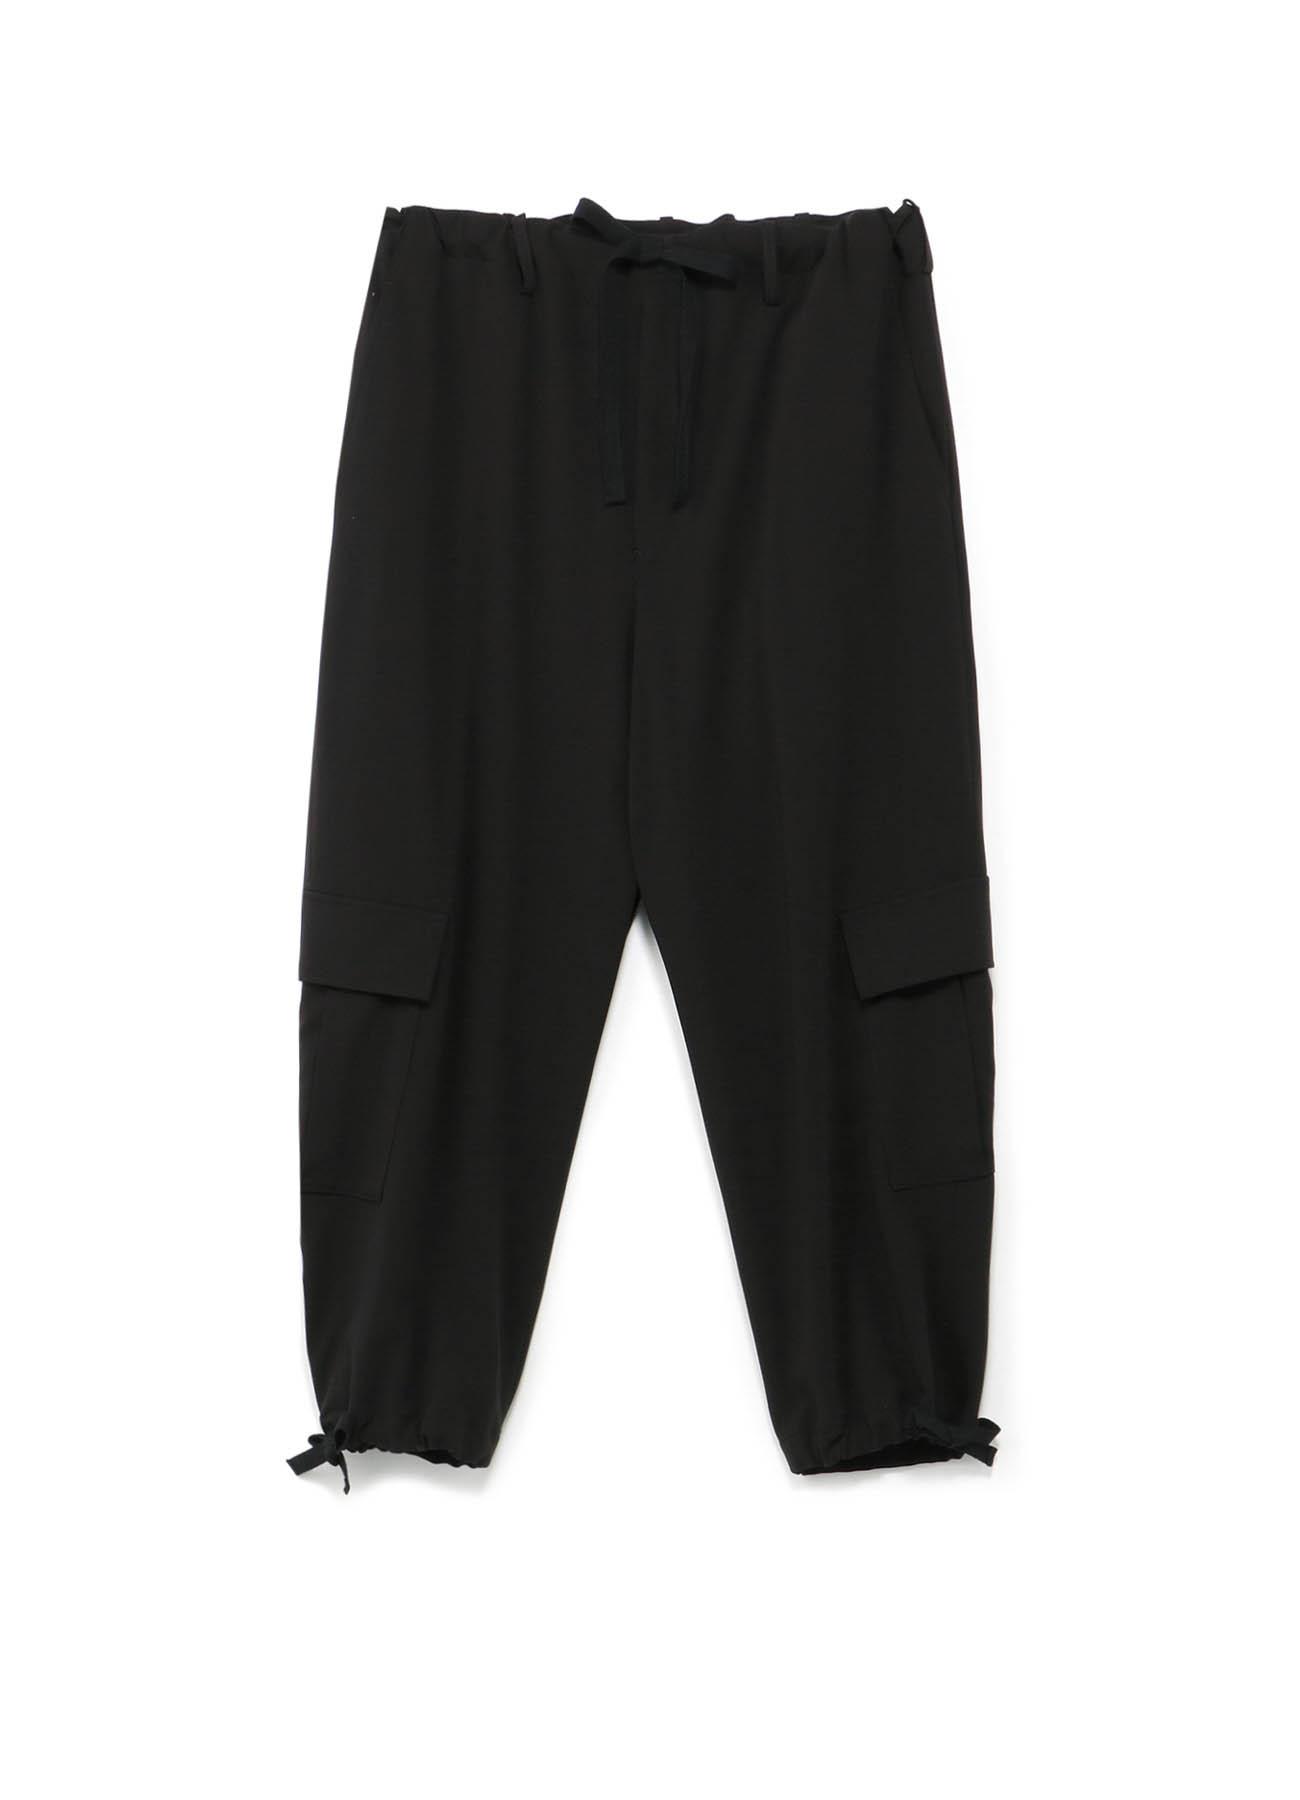 Pe/Rayon Gabardine Wide Cargo Pants